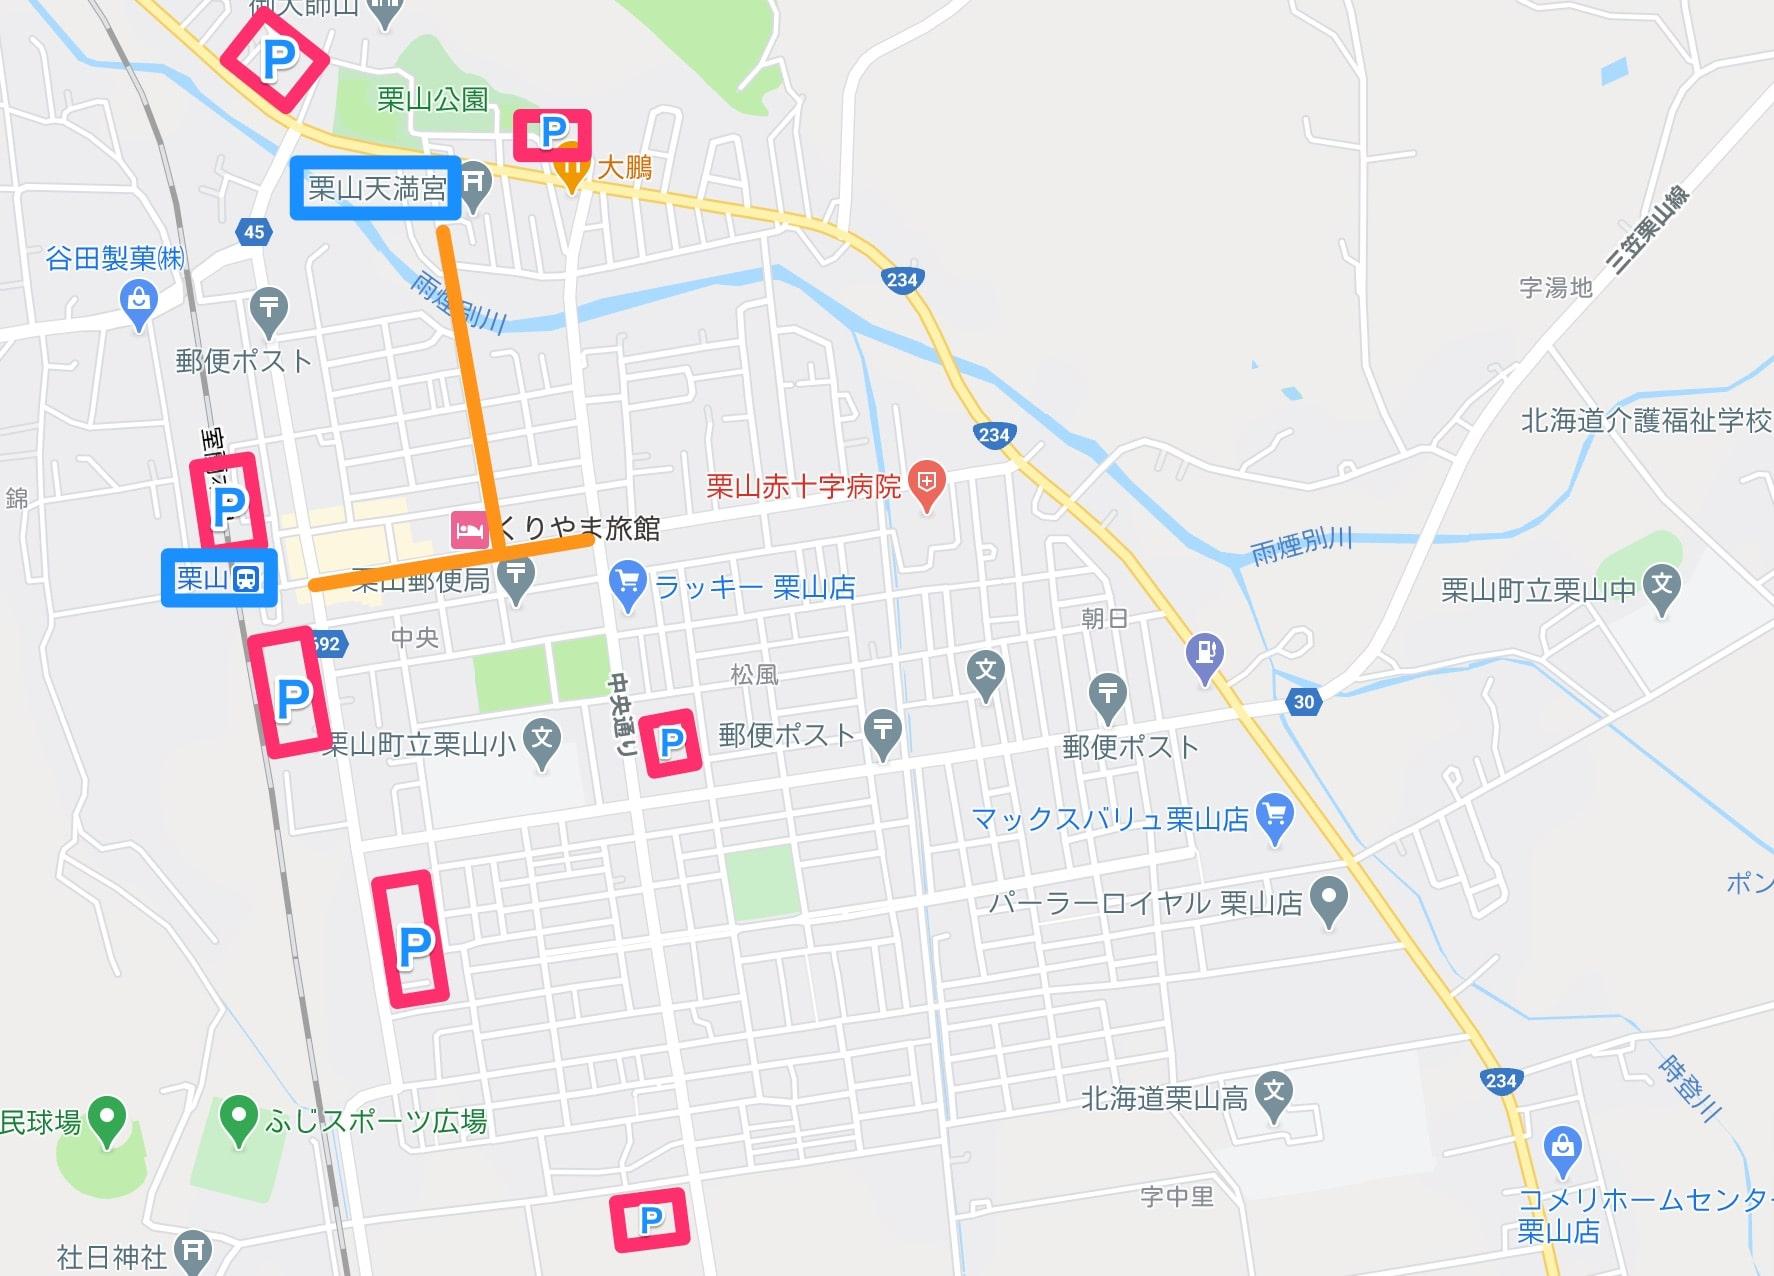 栗山天満宮秋季例大祭駐車場マップ